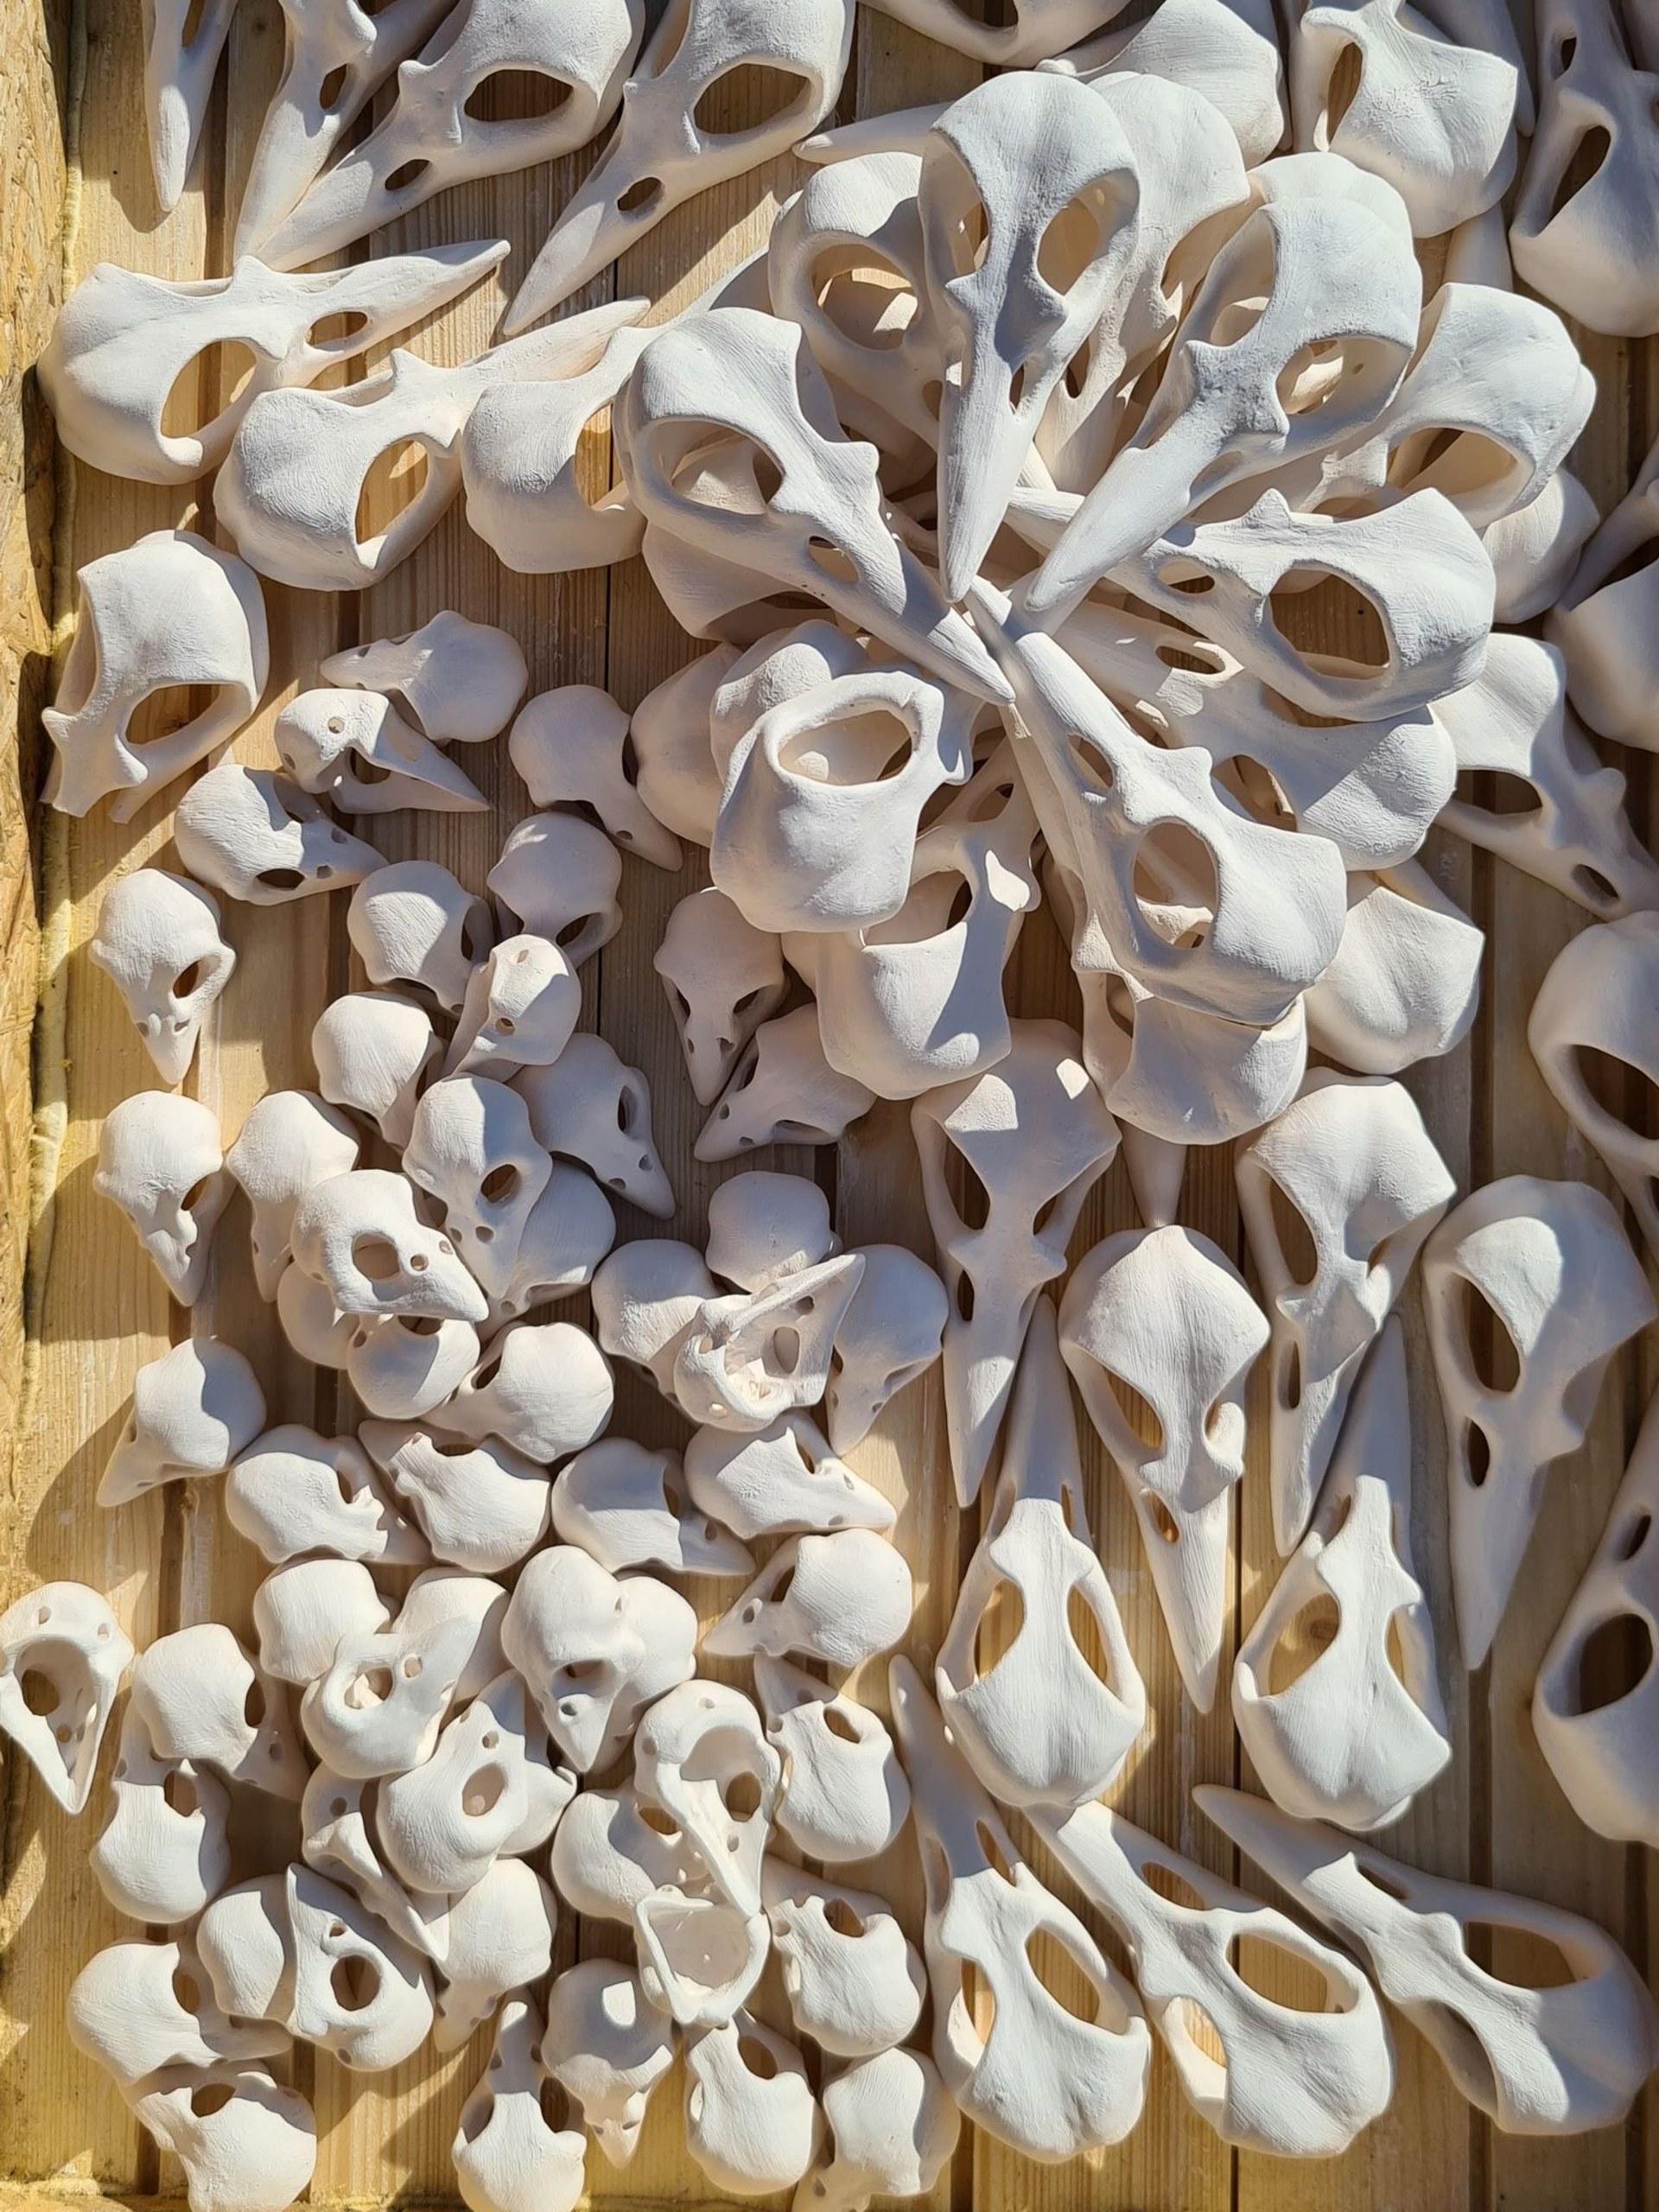 Work in process unglazed white stoneware.